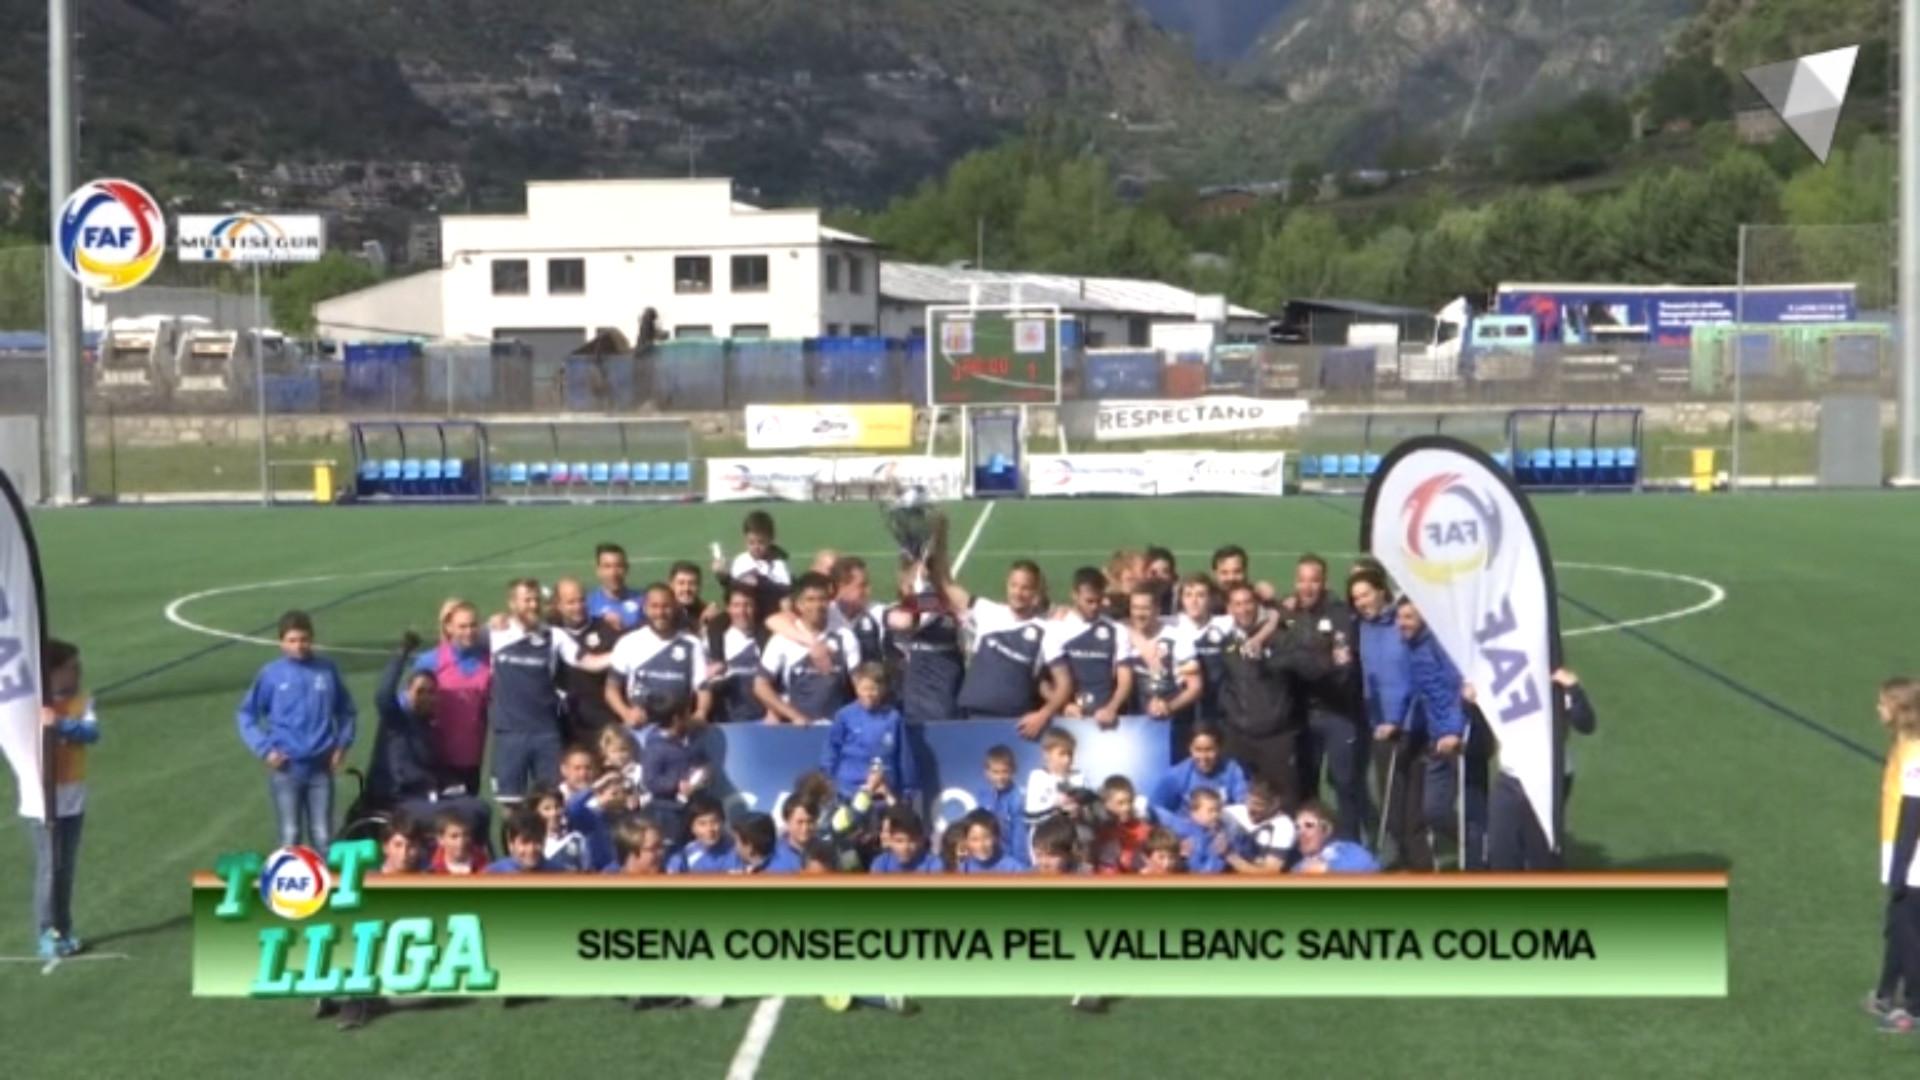 Tot Lliga - Sisena consecutiva per al VallBanc Santa Coloma